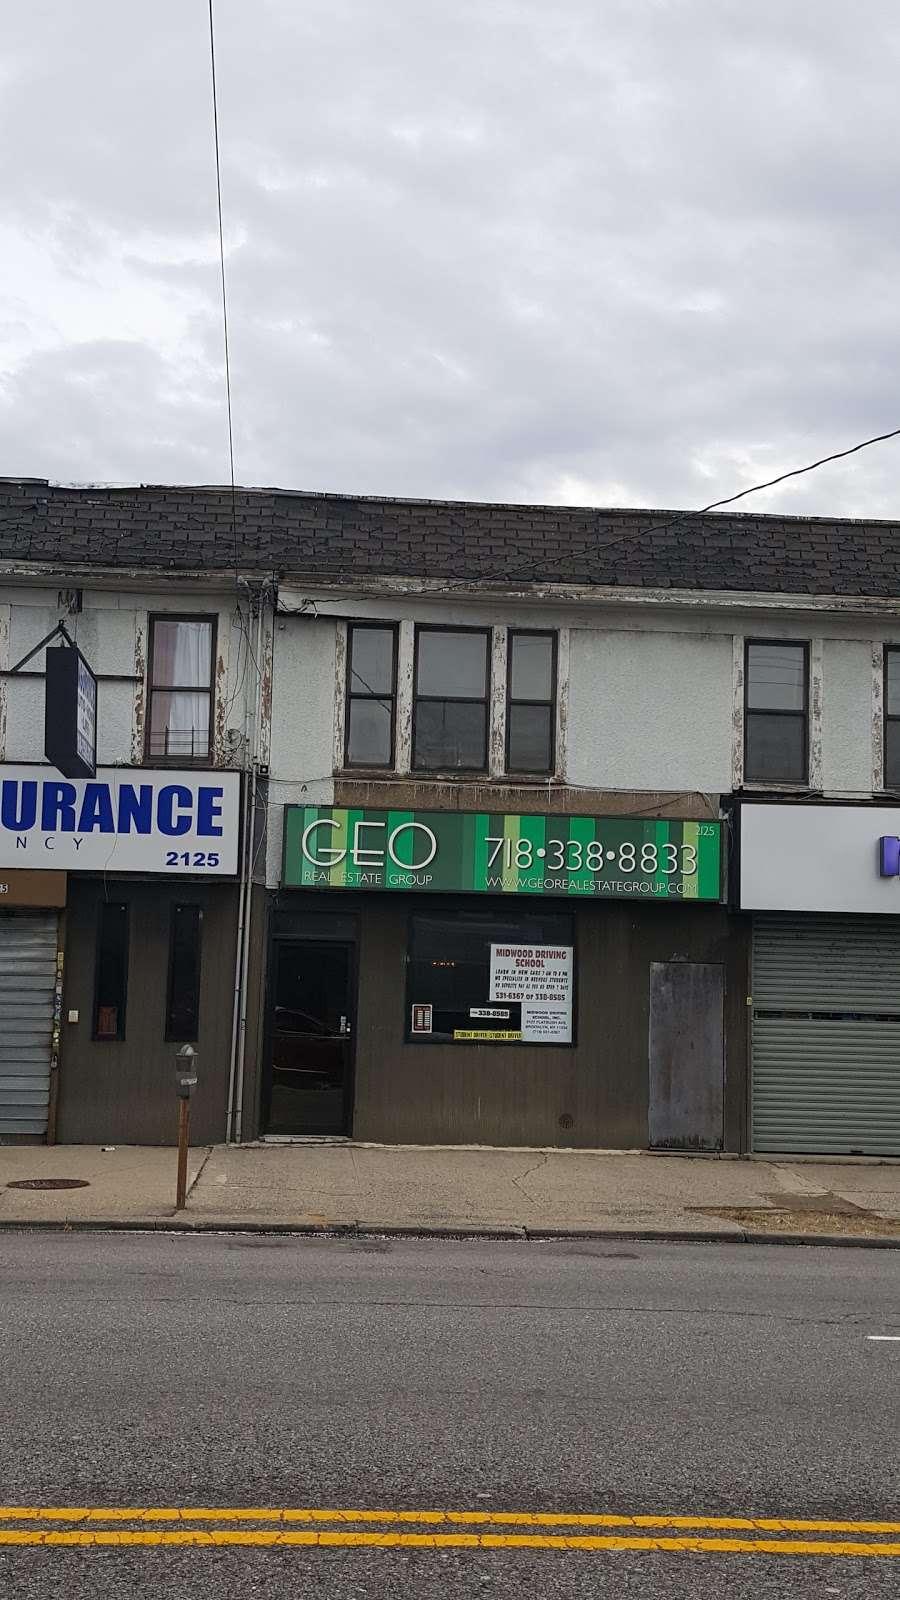 Geo Real Estate Group - real estate agency  | Photo 1 of 1 | Address: 2127 Flatbush Ave, Brooklyn, NY 11234, USA | Phone: (718) 338-8833